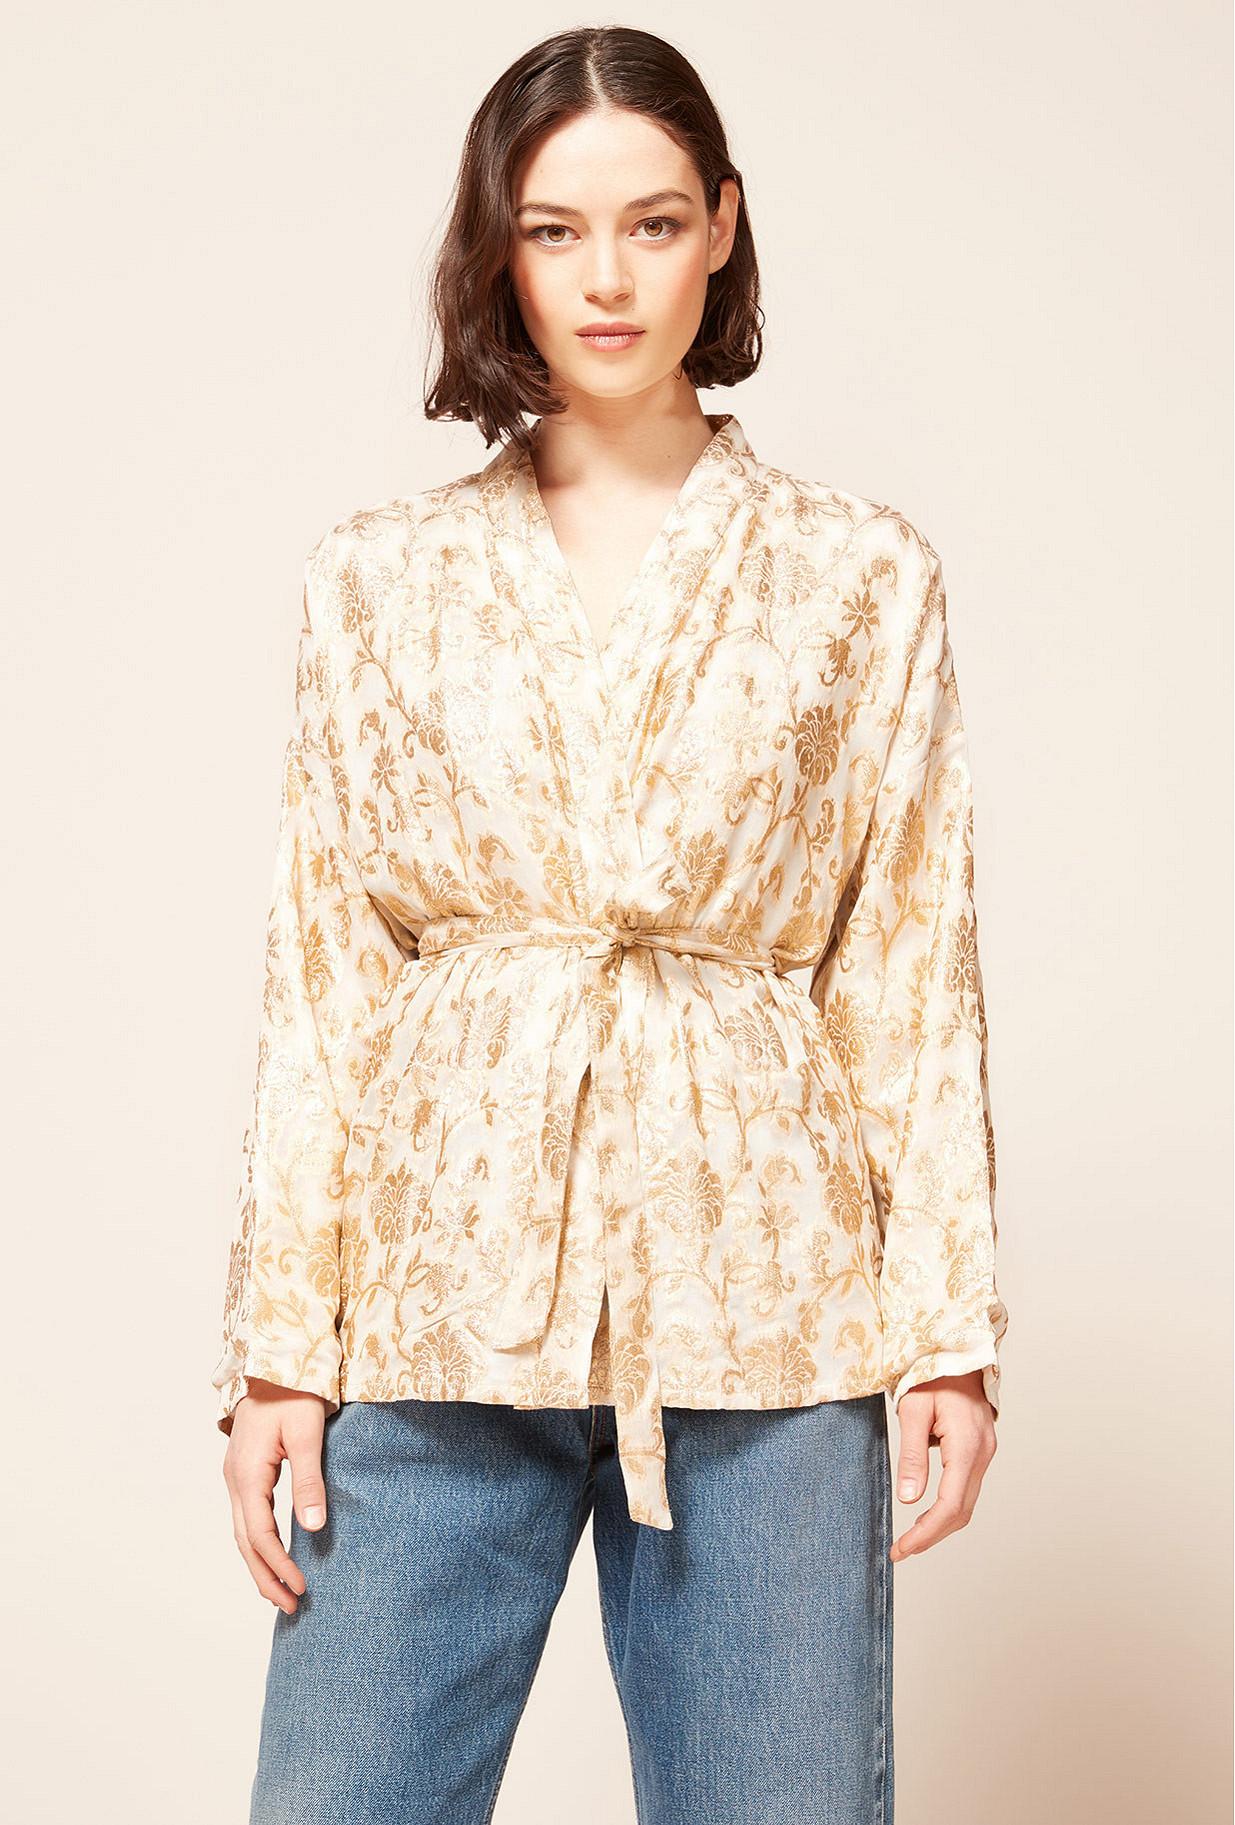 Kimono Or Marignan Mes Demoiselles Paris